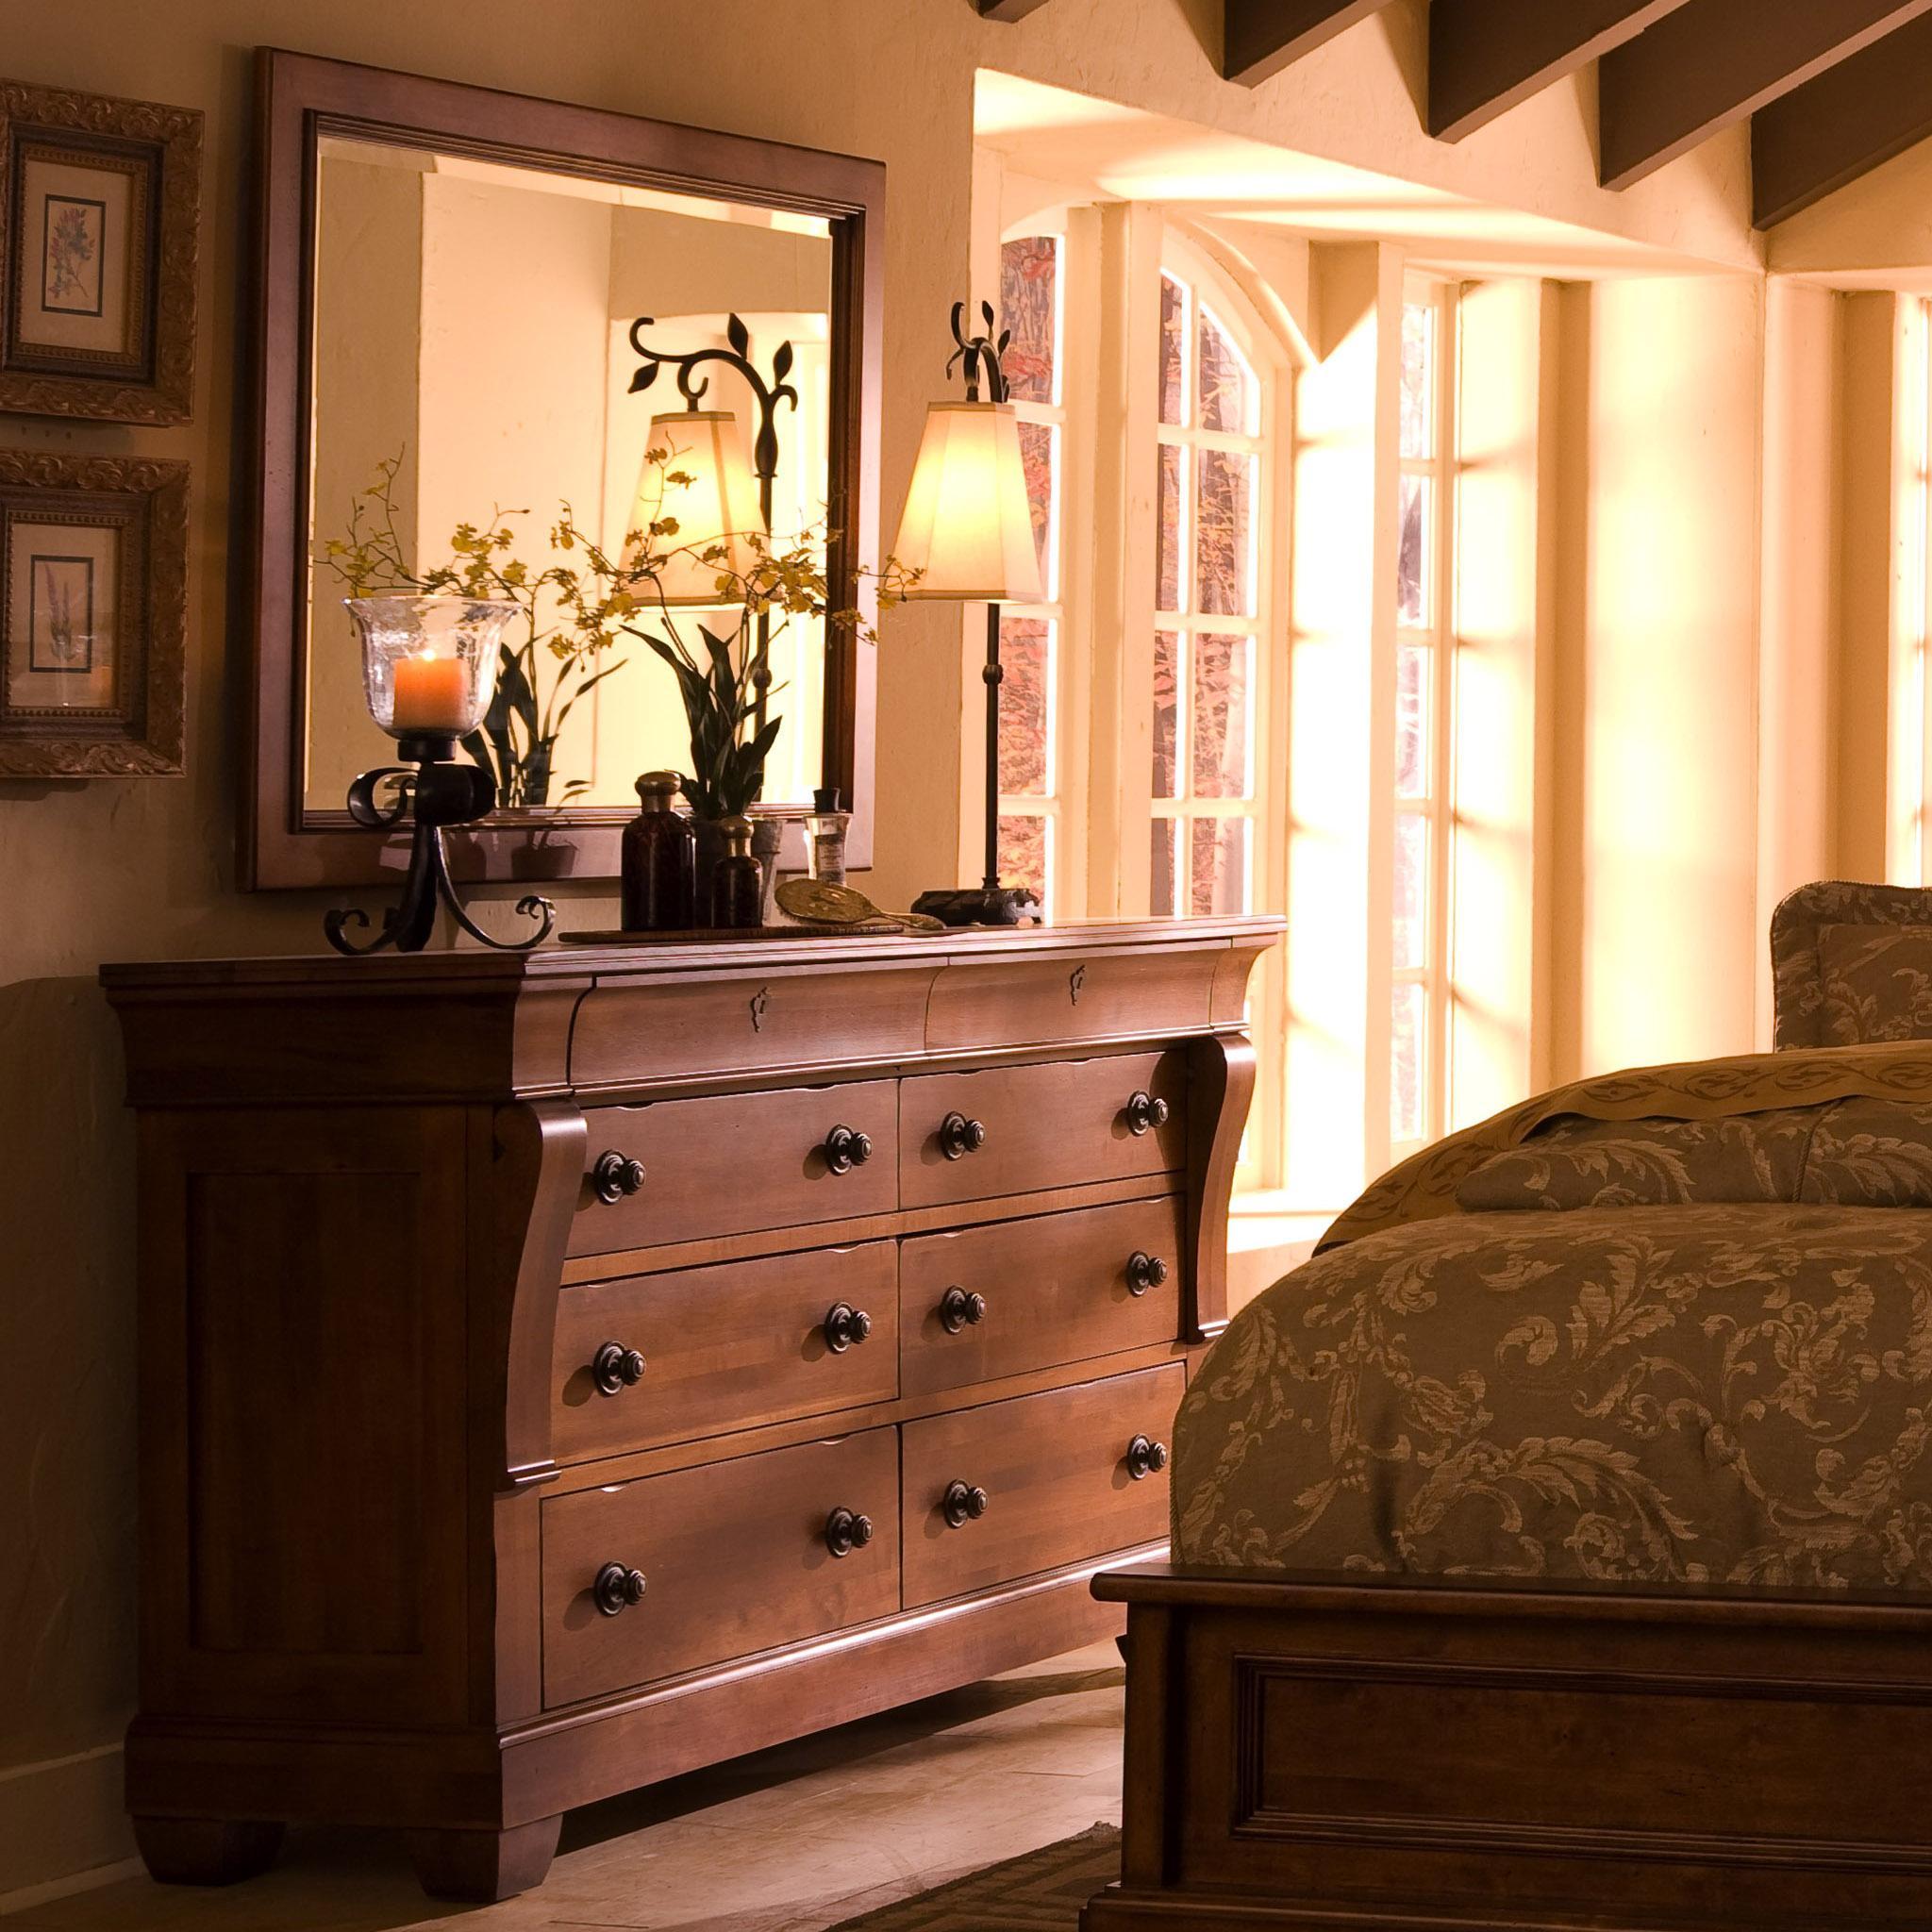 Kincaid Furniture Tuscano 8 Drawer Dresser With Landscape Mirror Hudson 39 S Furniture Dresser